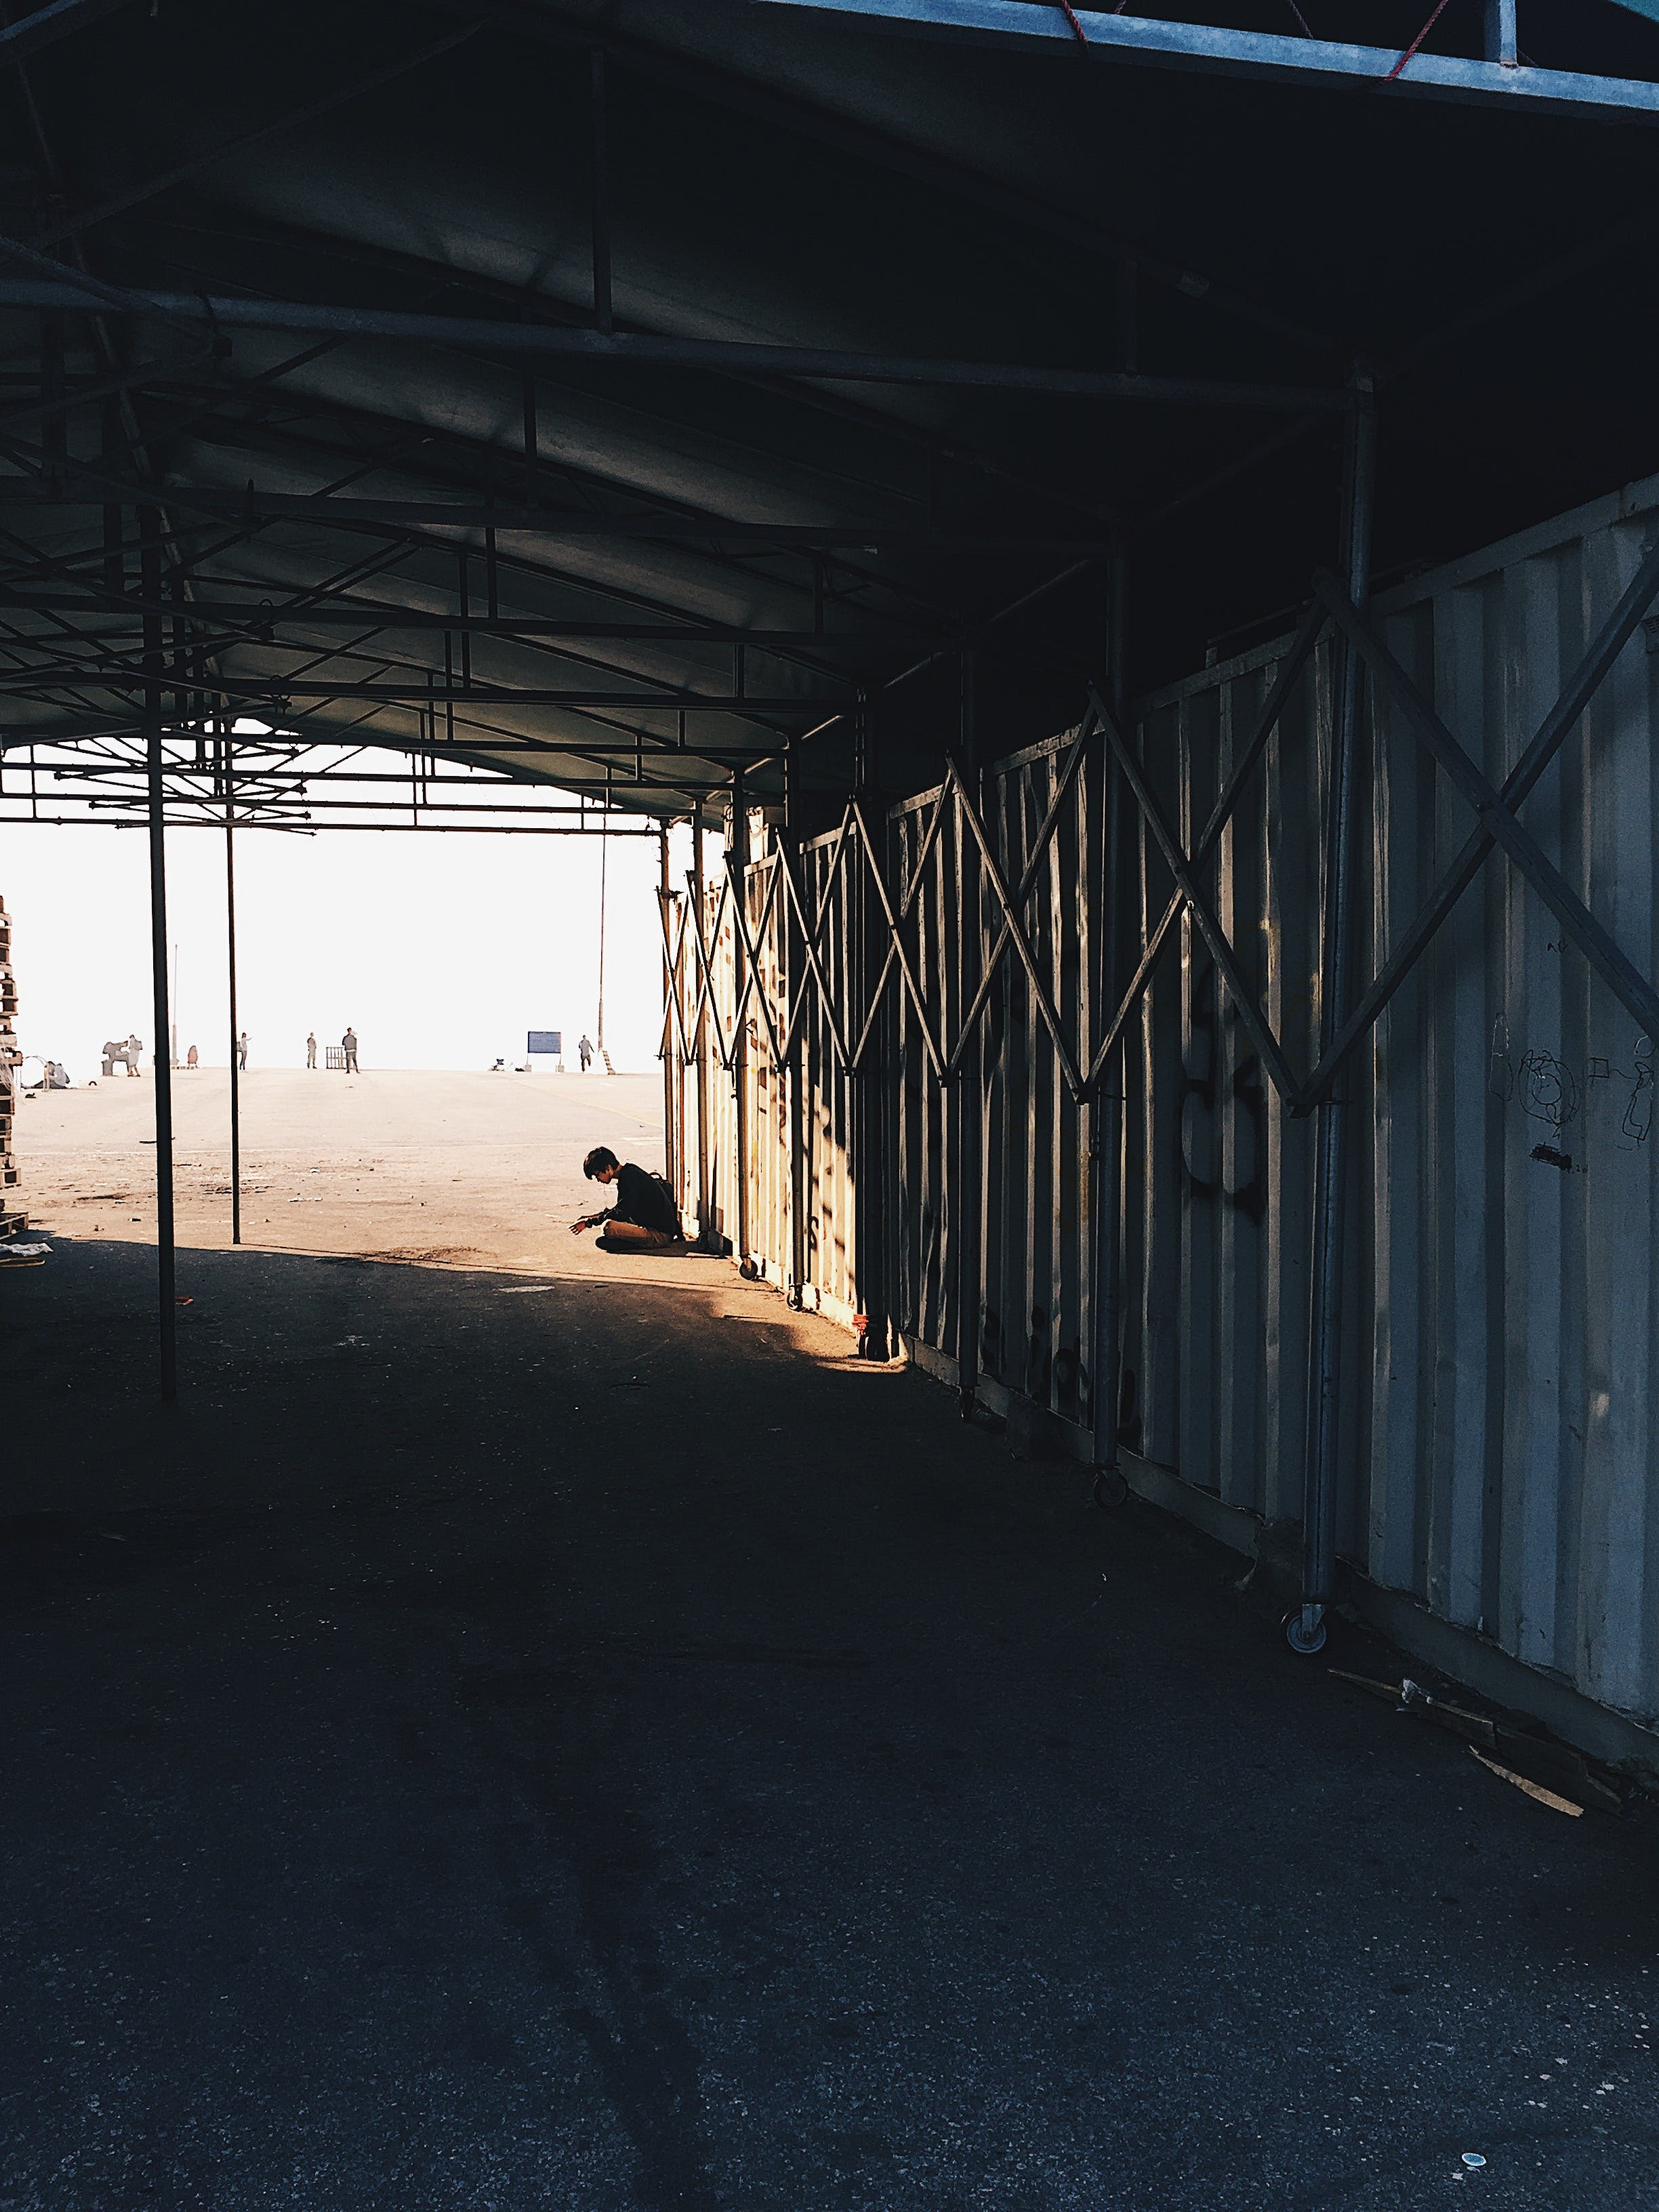 Free stock photo of pier, gate, alone, garage